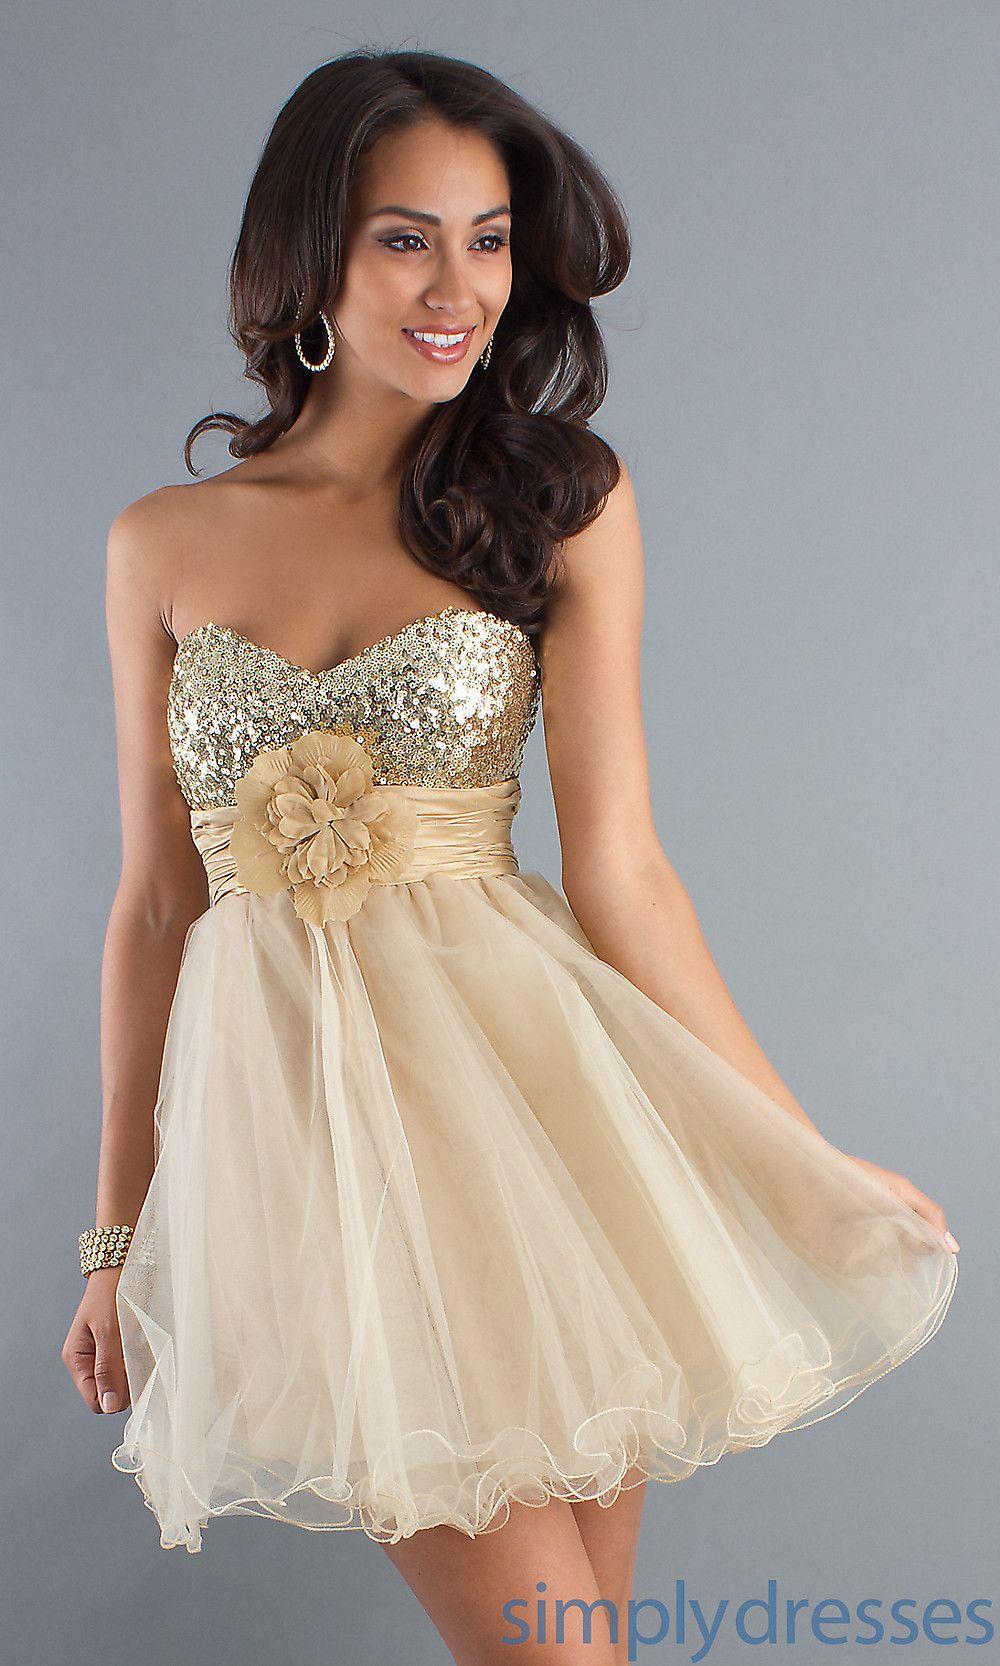 Short Strapless Gold Sweetheart Party Dress Strapless Party Dress Party Dress Formal Party Dress [ 1666 x 1000 Pixel ]